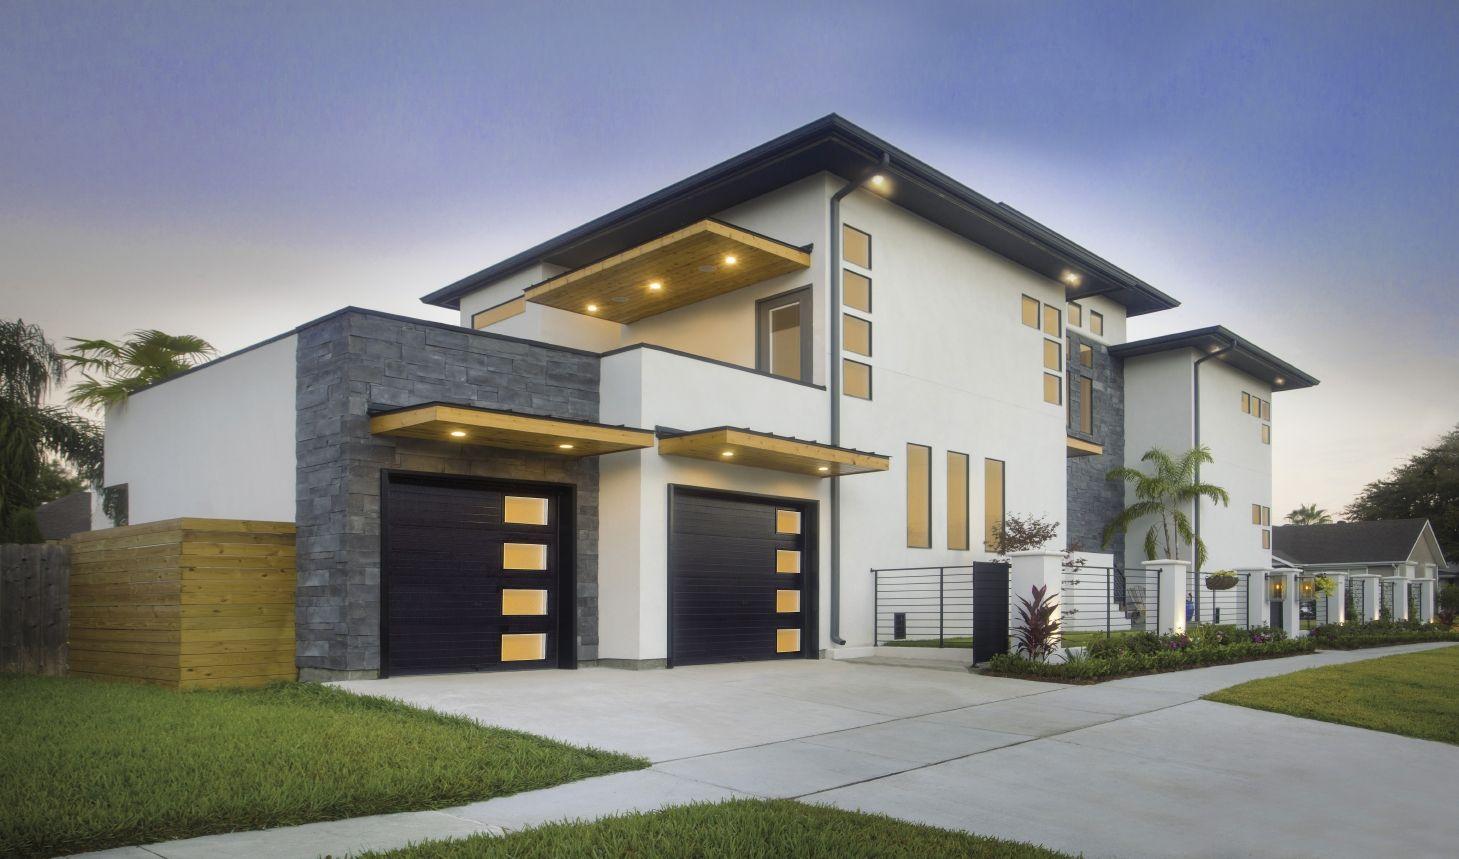 Garage Doors For Modern Home Styles Sleek Black Clopay